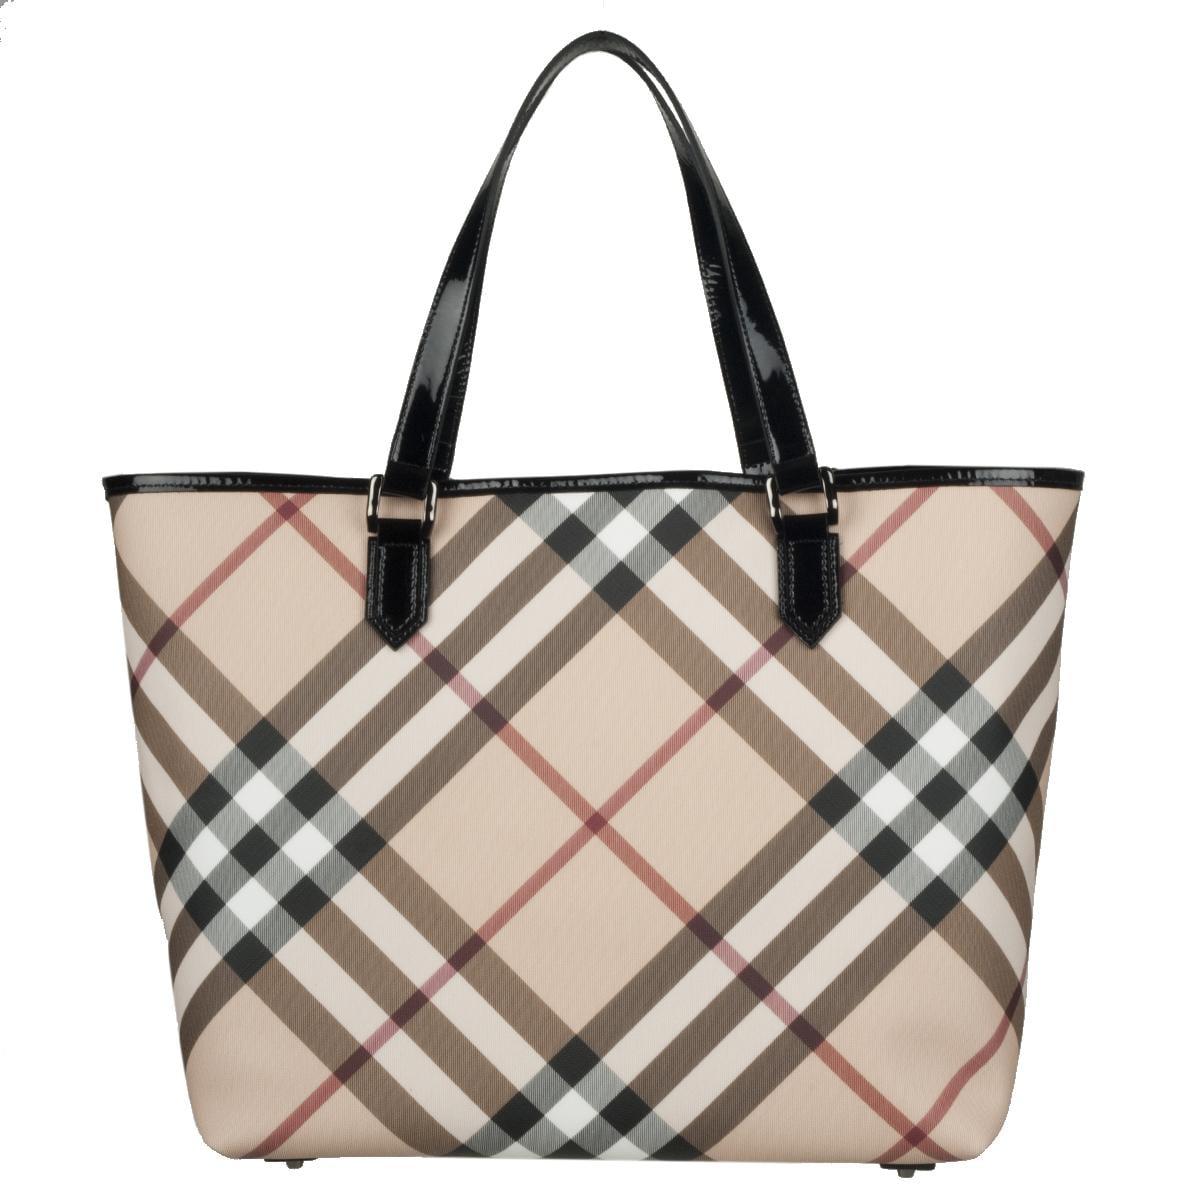 burberry handbag outlet ll06  burberry plaid tote